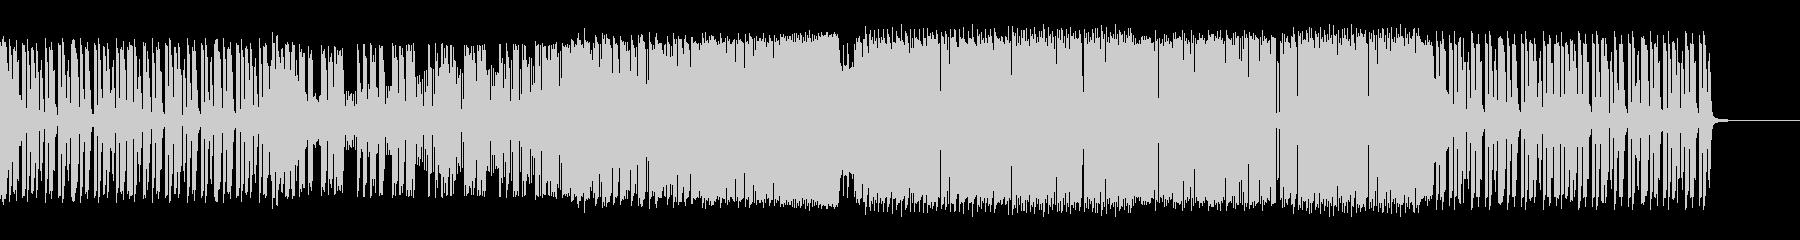 DJ Snakeを参考にしたトラップの未再生の波形